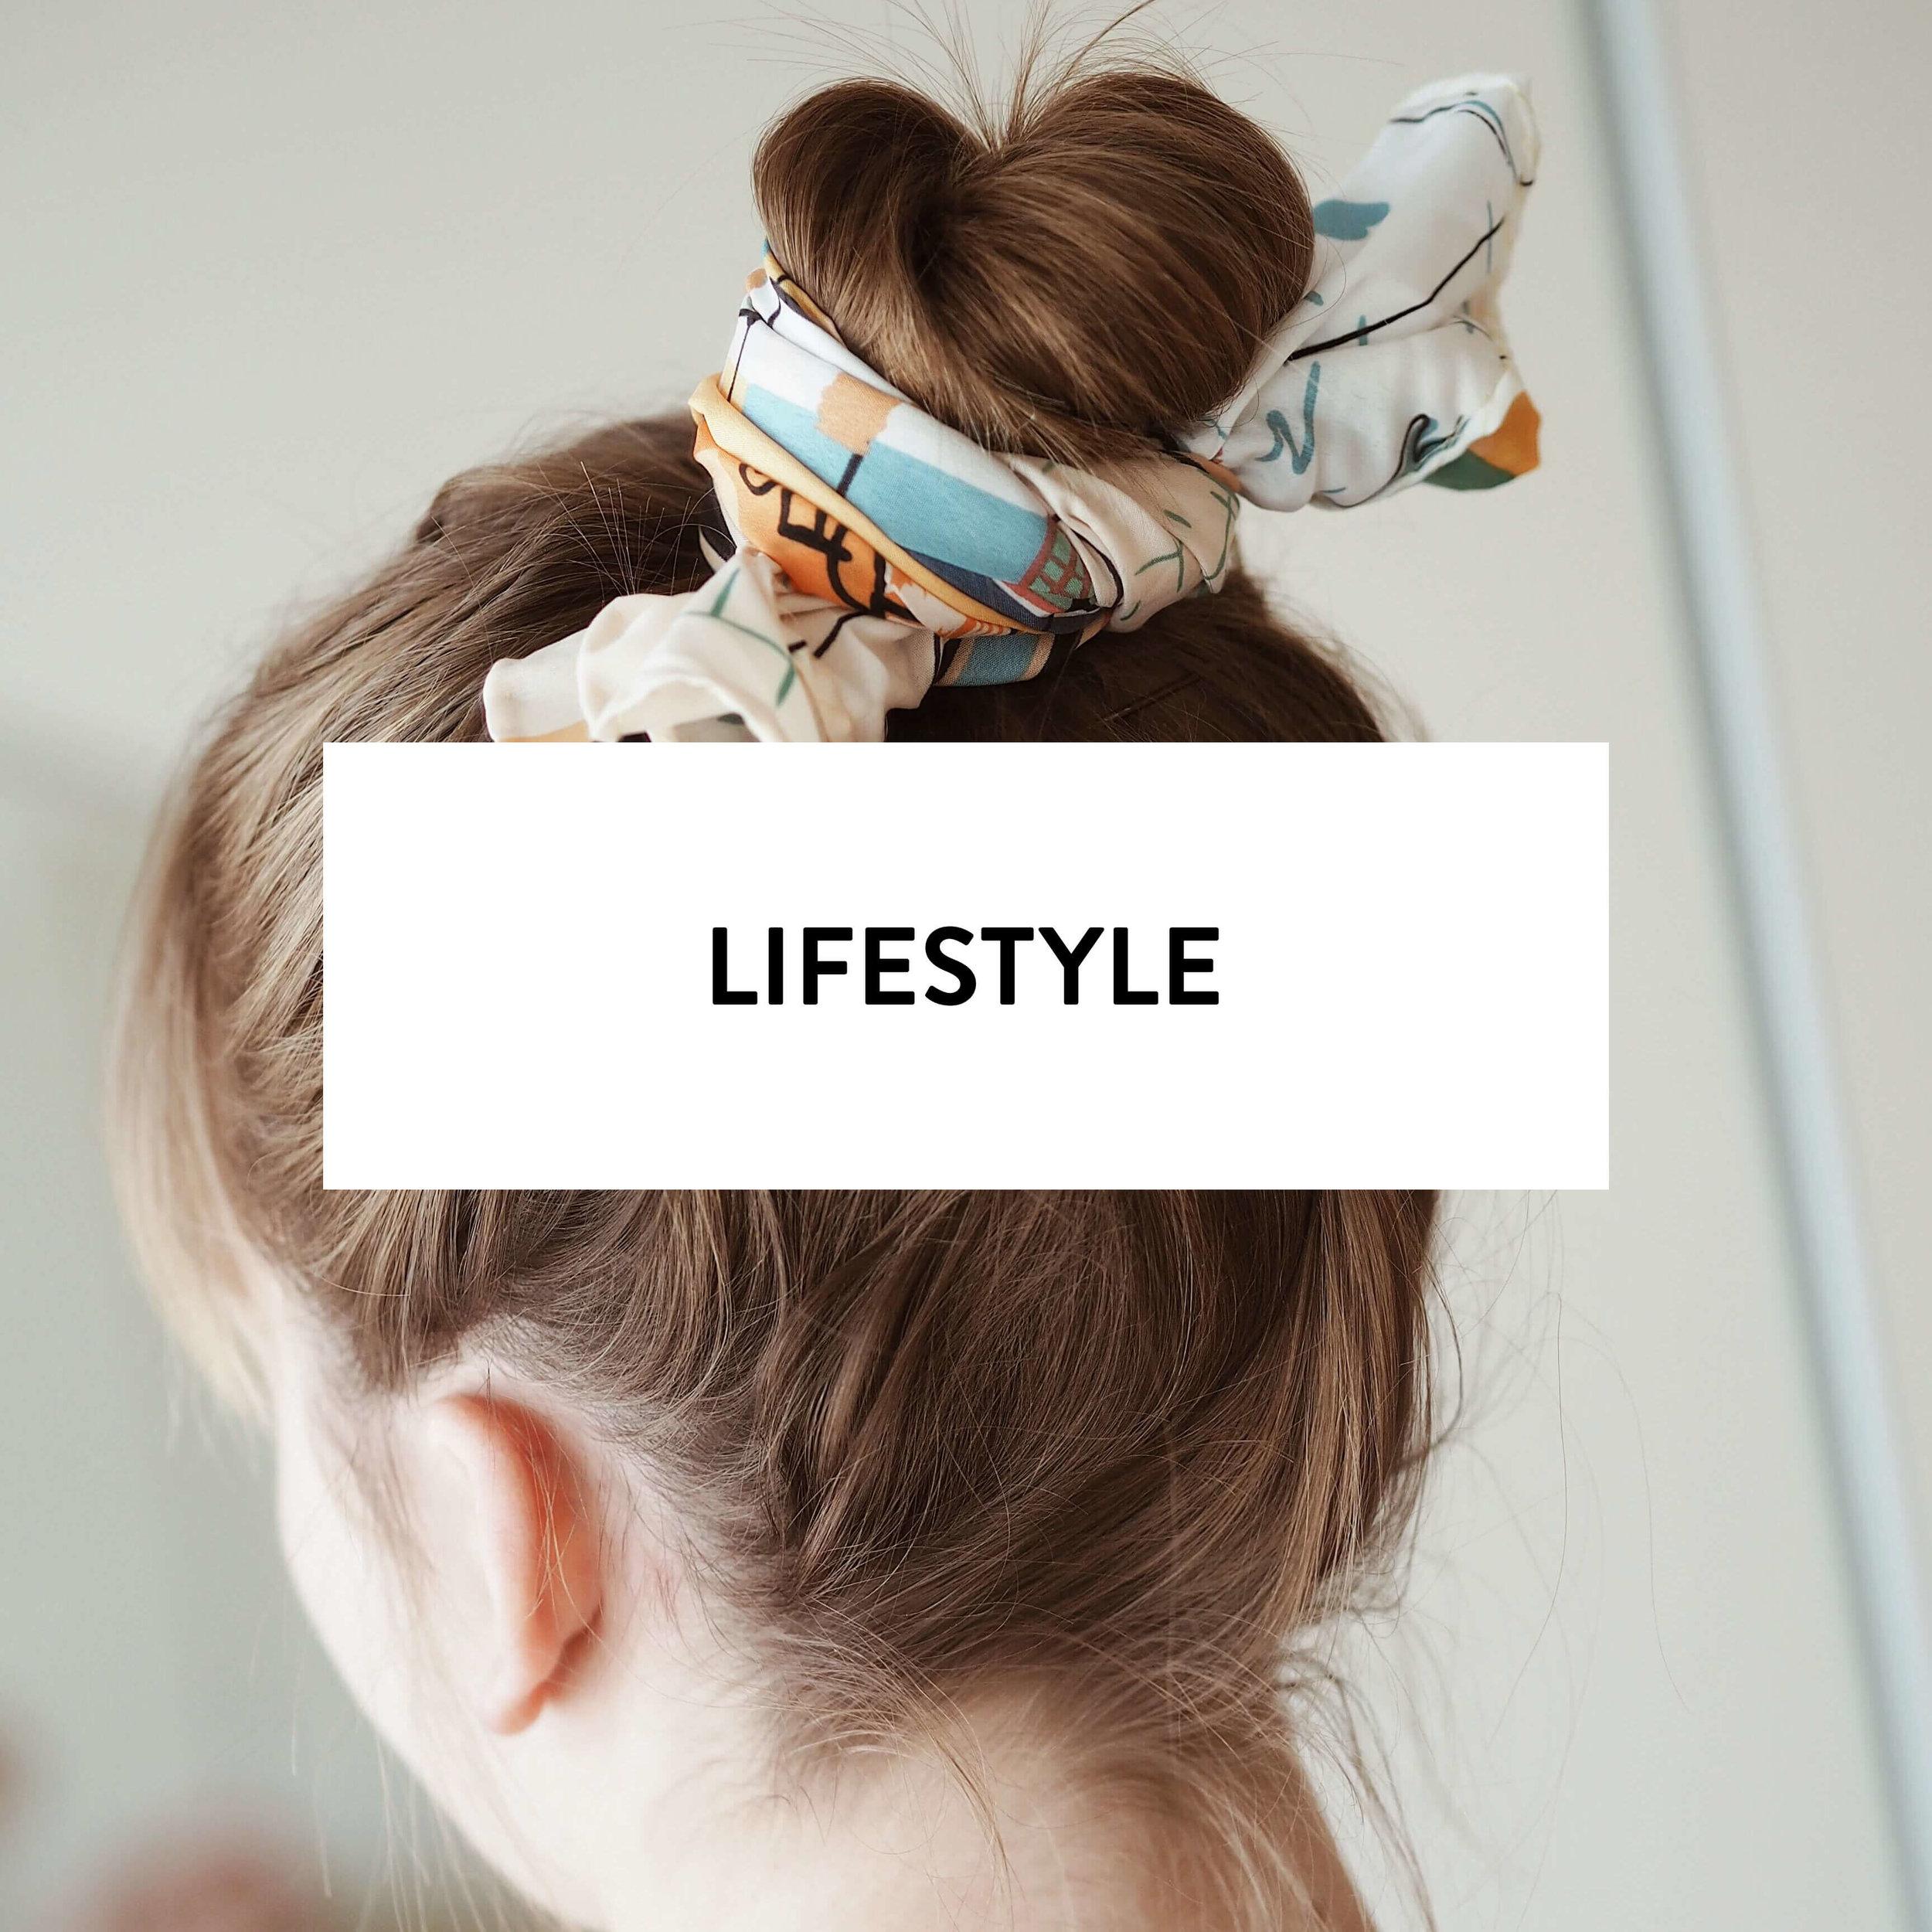 lifestyle-new.jpg